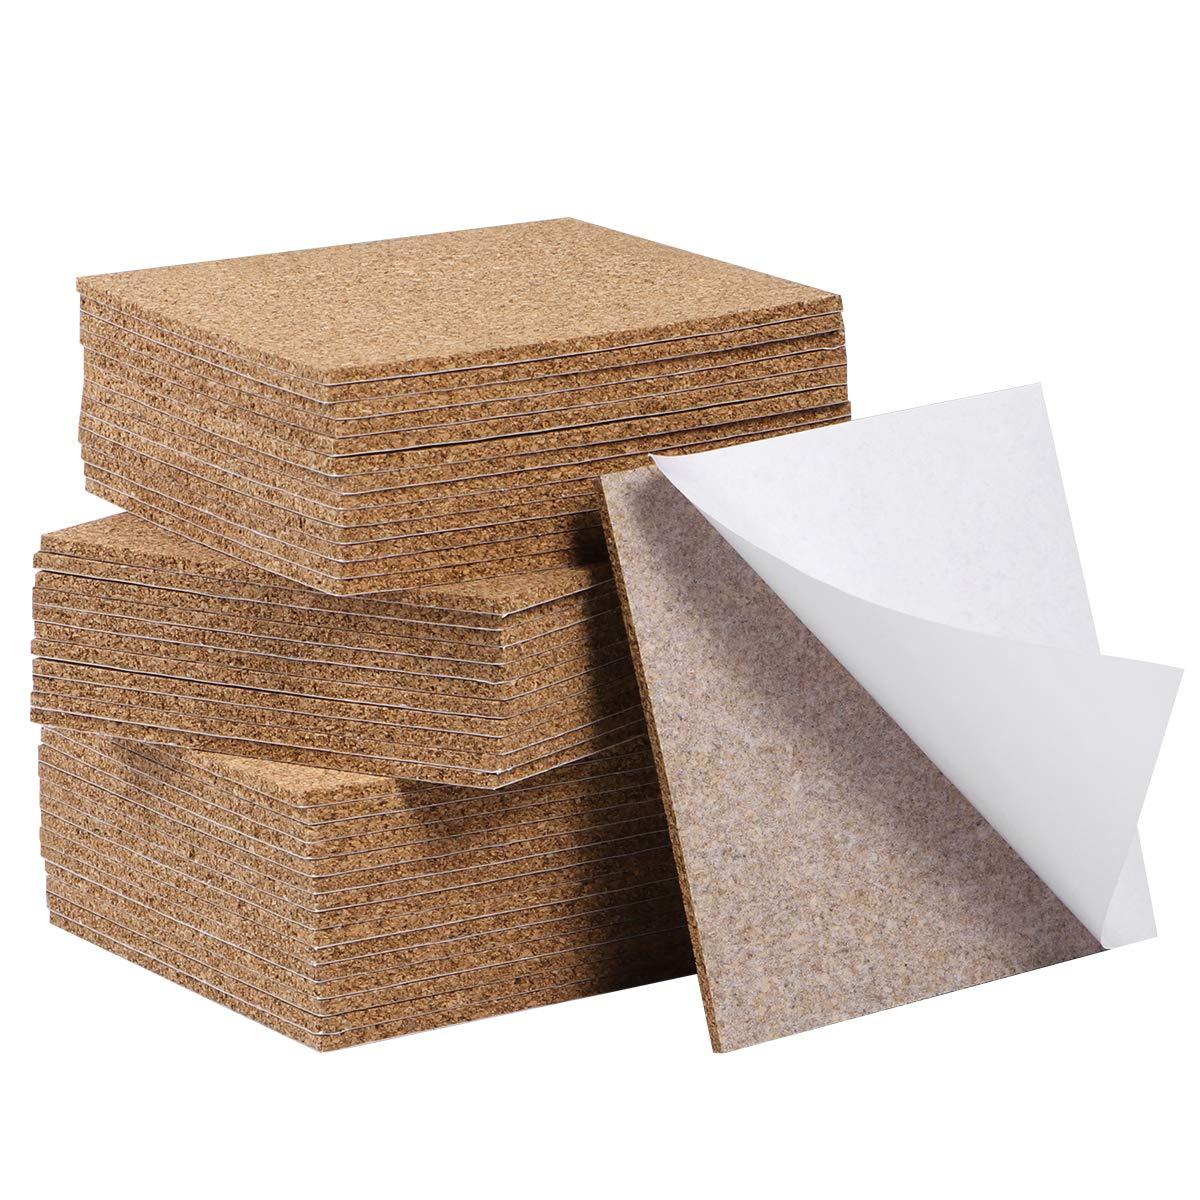 SUPVOX 80 pcs Cork Board Sheets for DIY Blank Cork Coasters Mat Decorative Cork Wall Tiles Self Adhesive Cork Squares